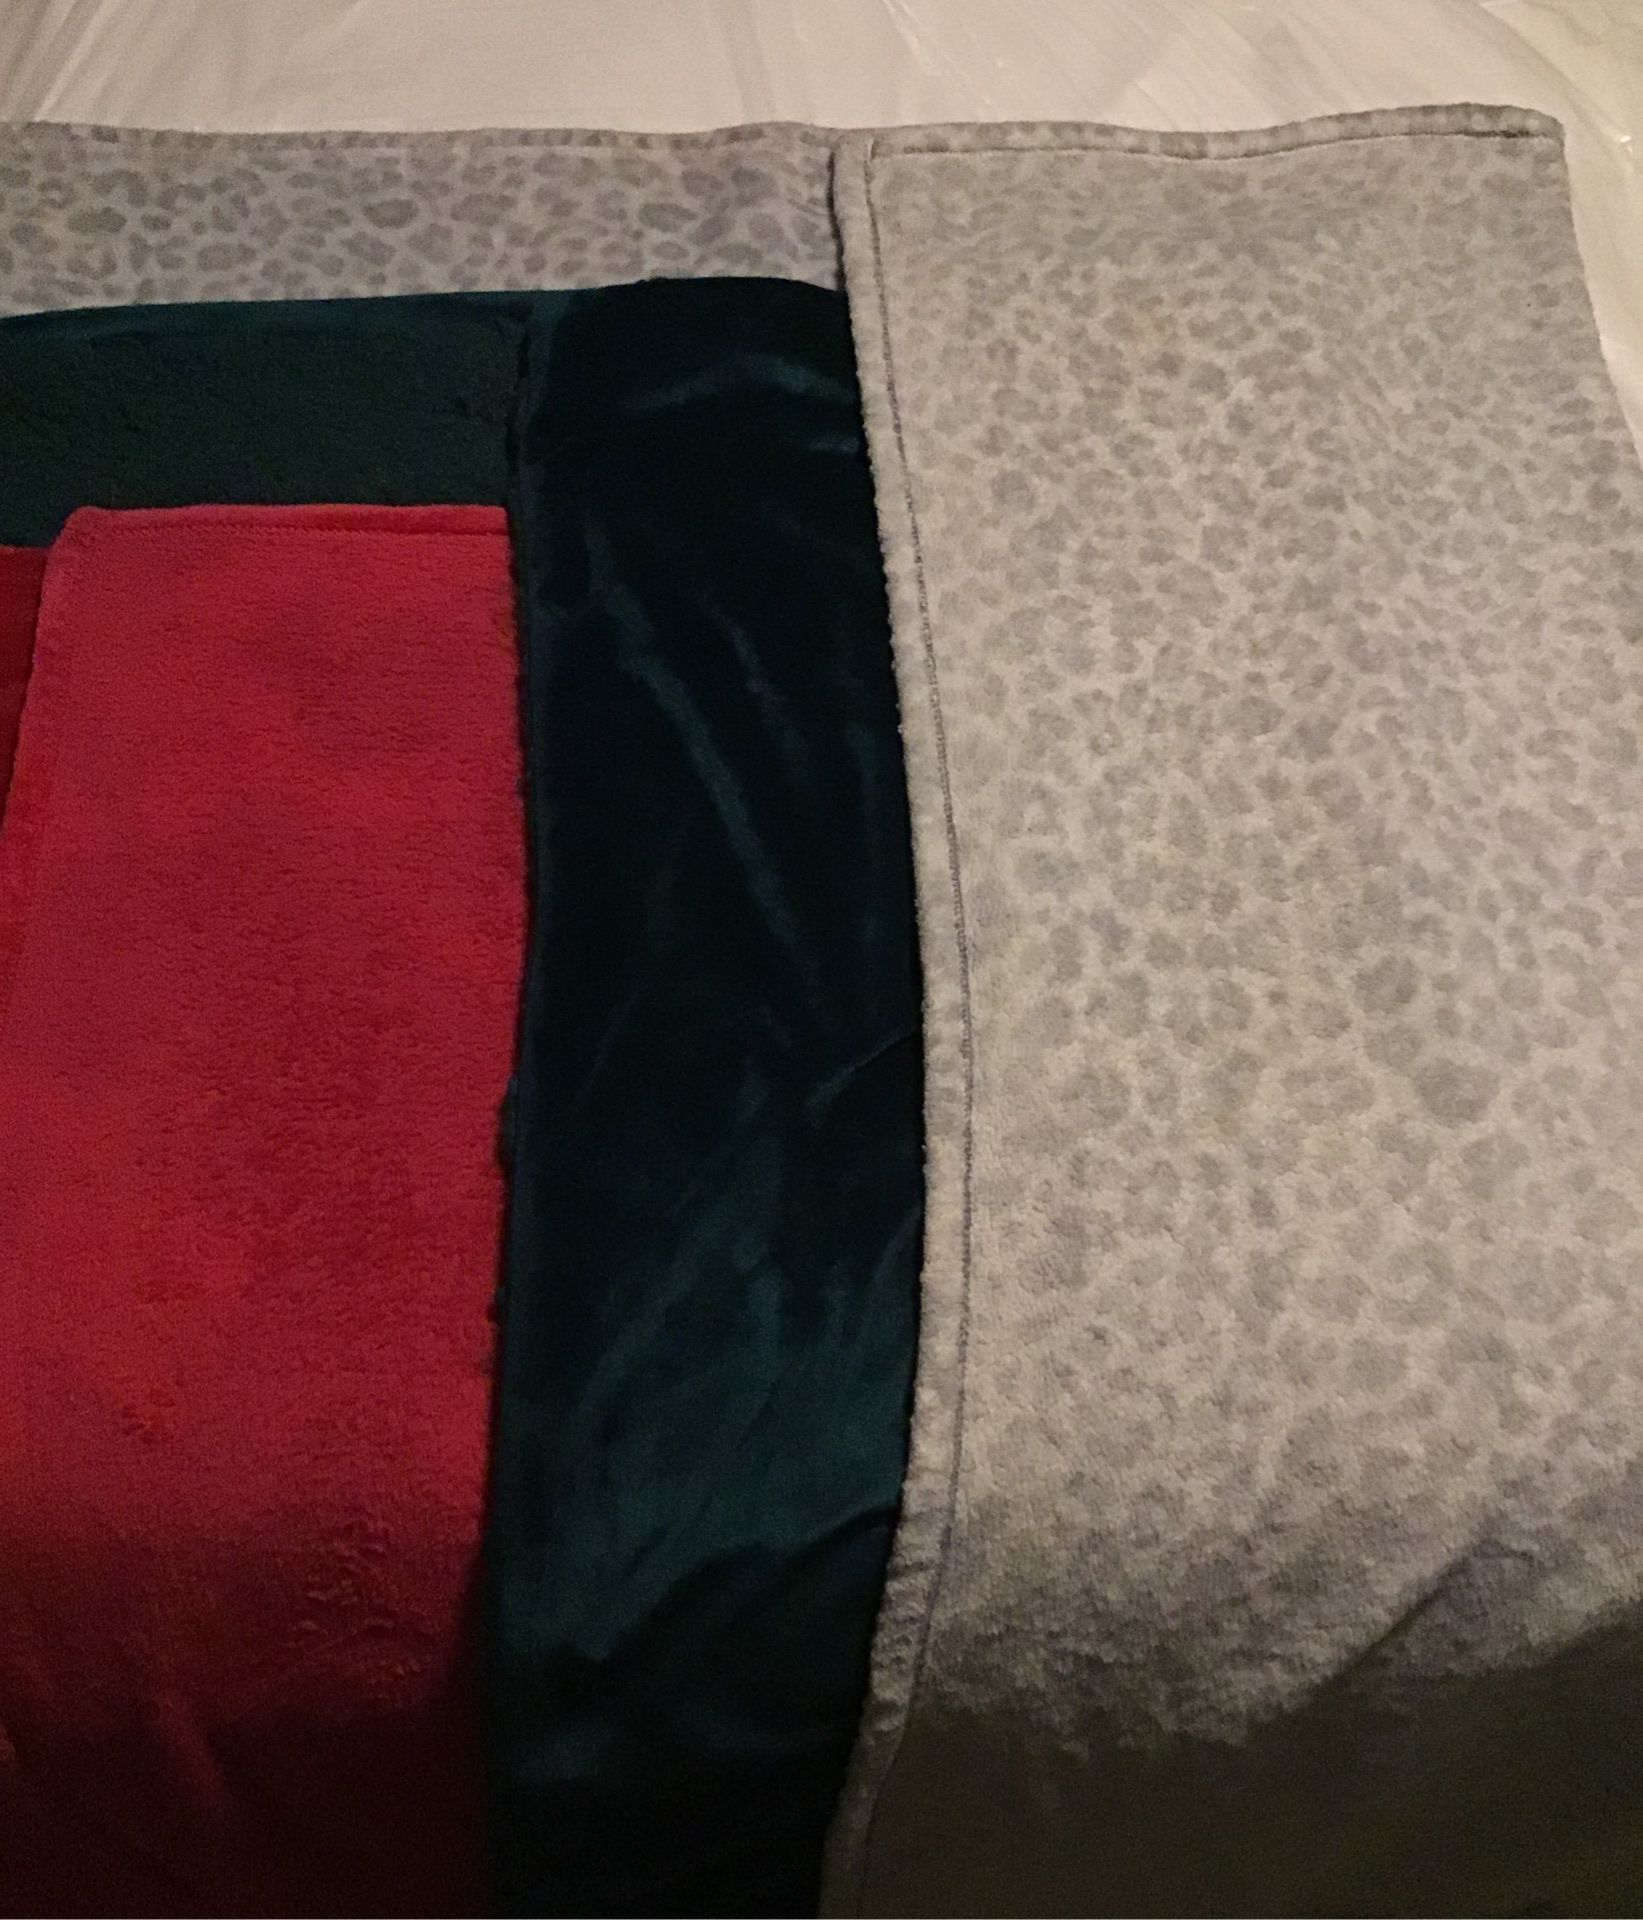 3 throw blankets